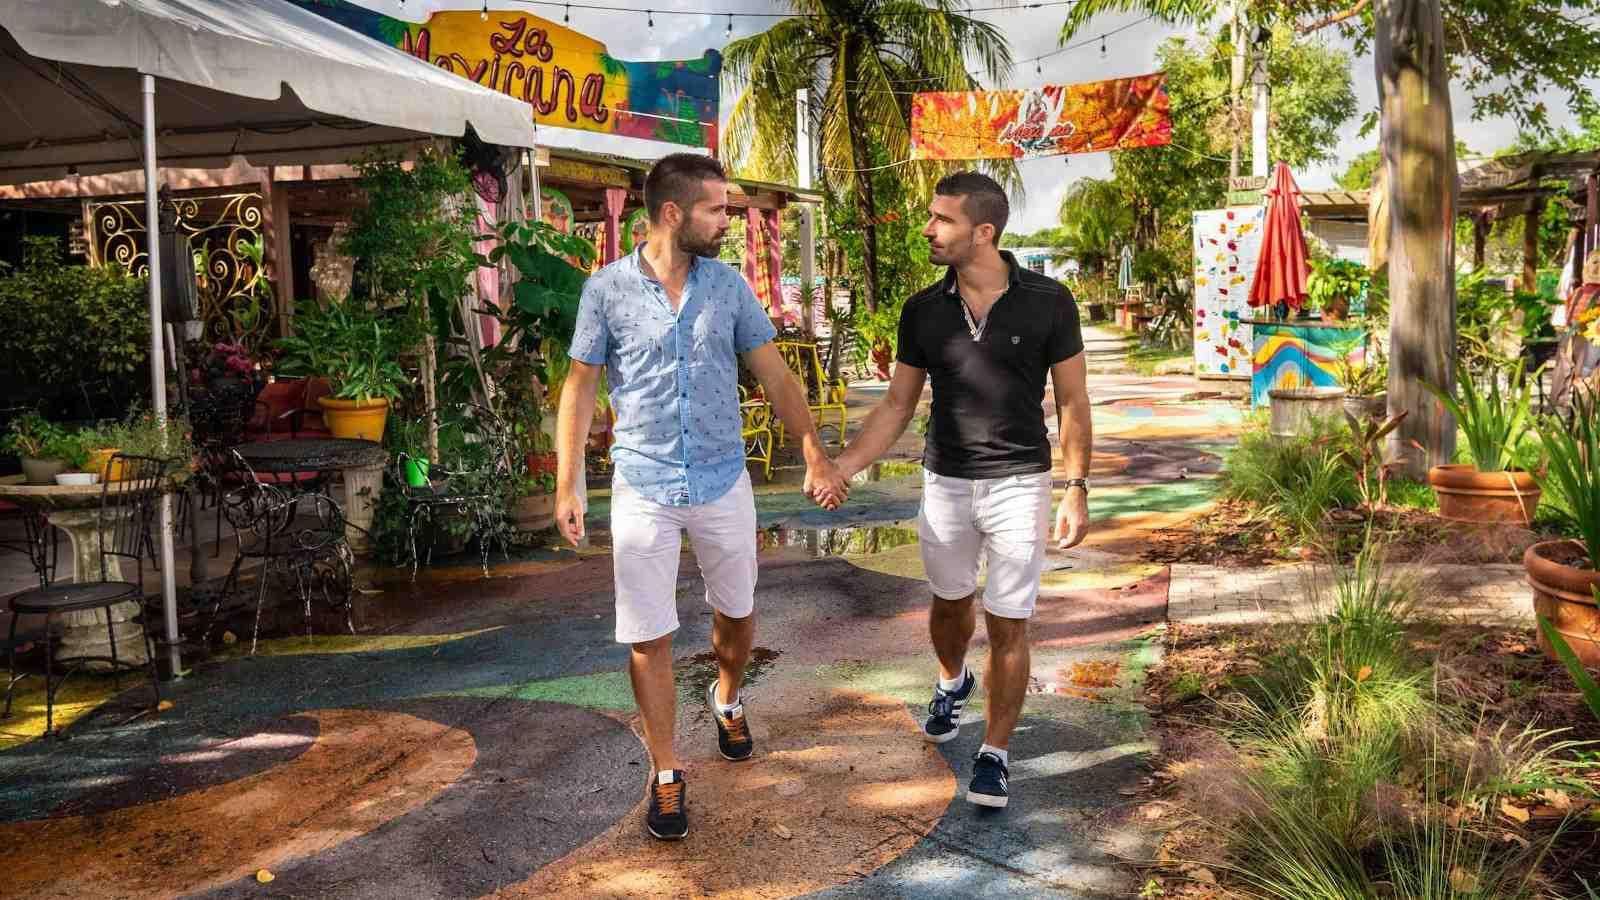 Gay Friendly Florida Travel Guide